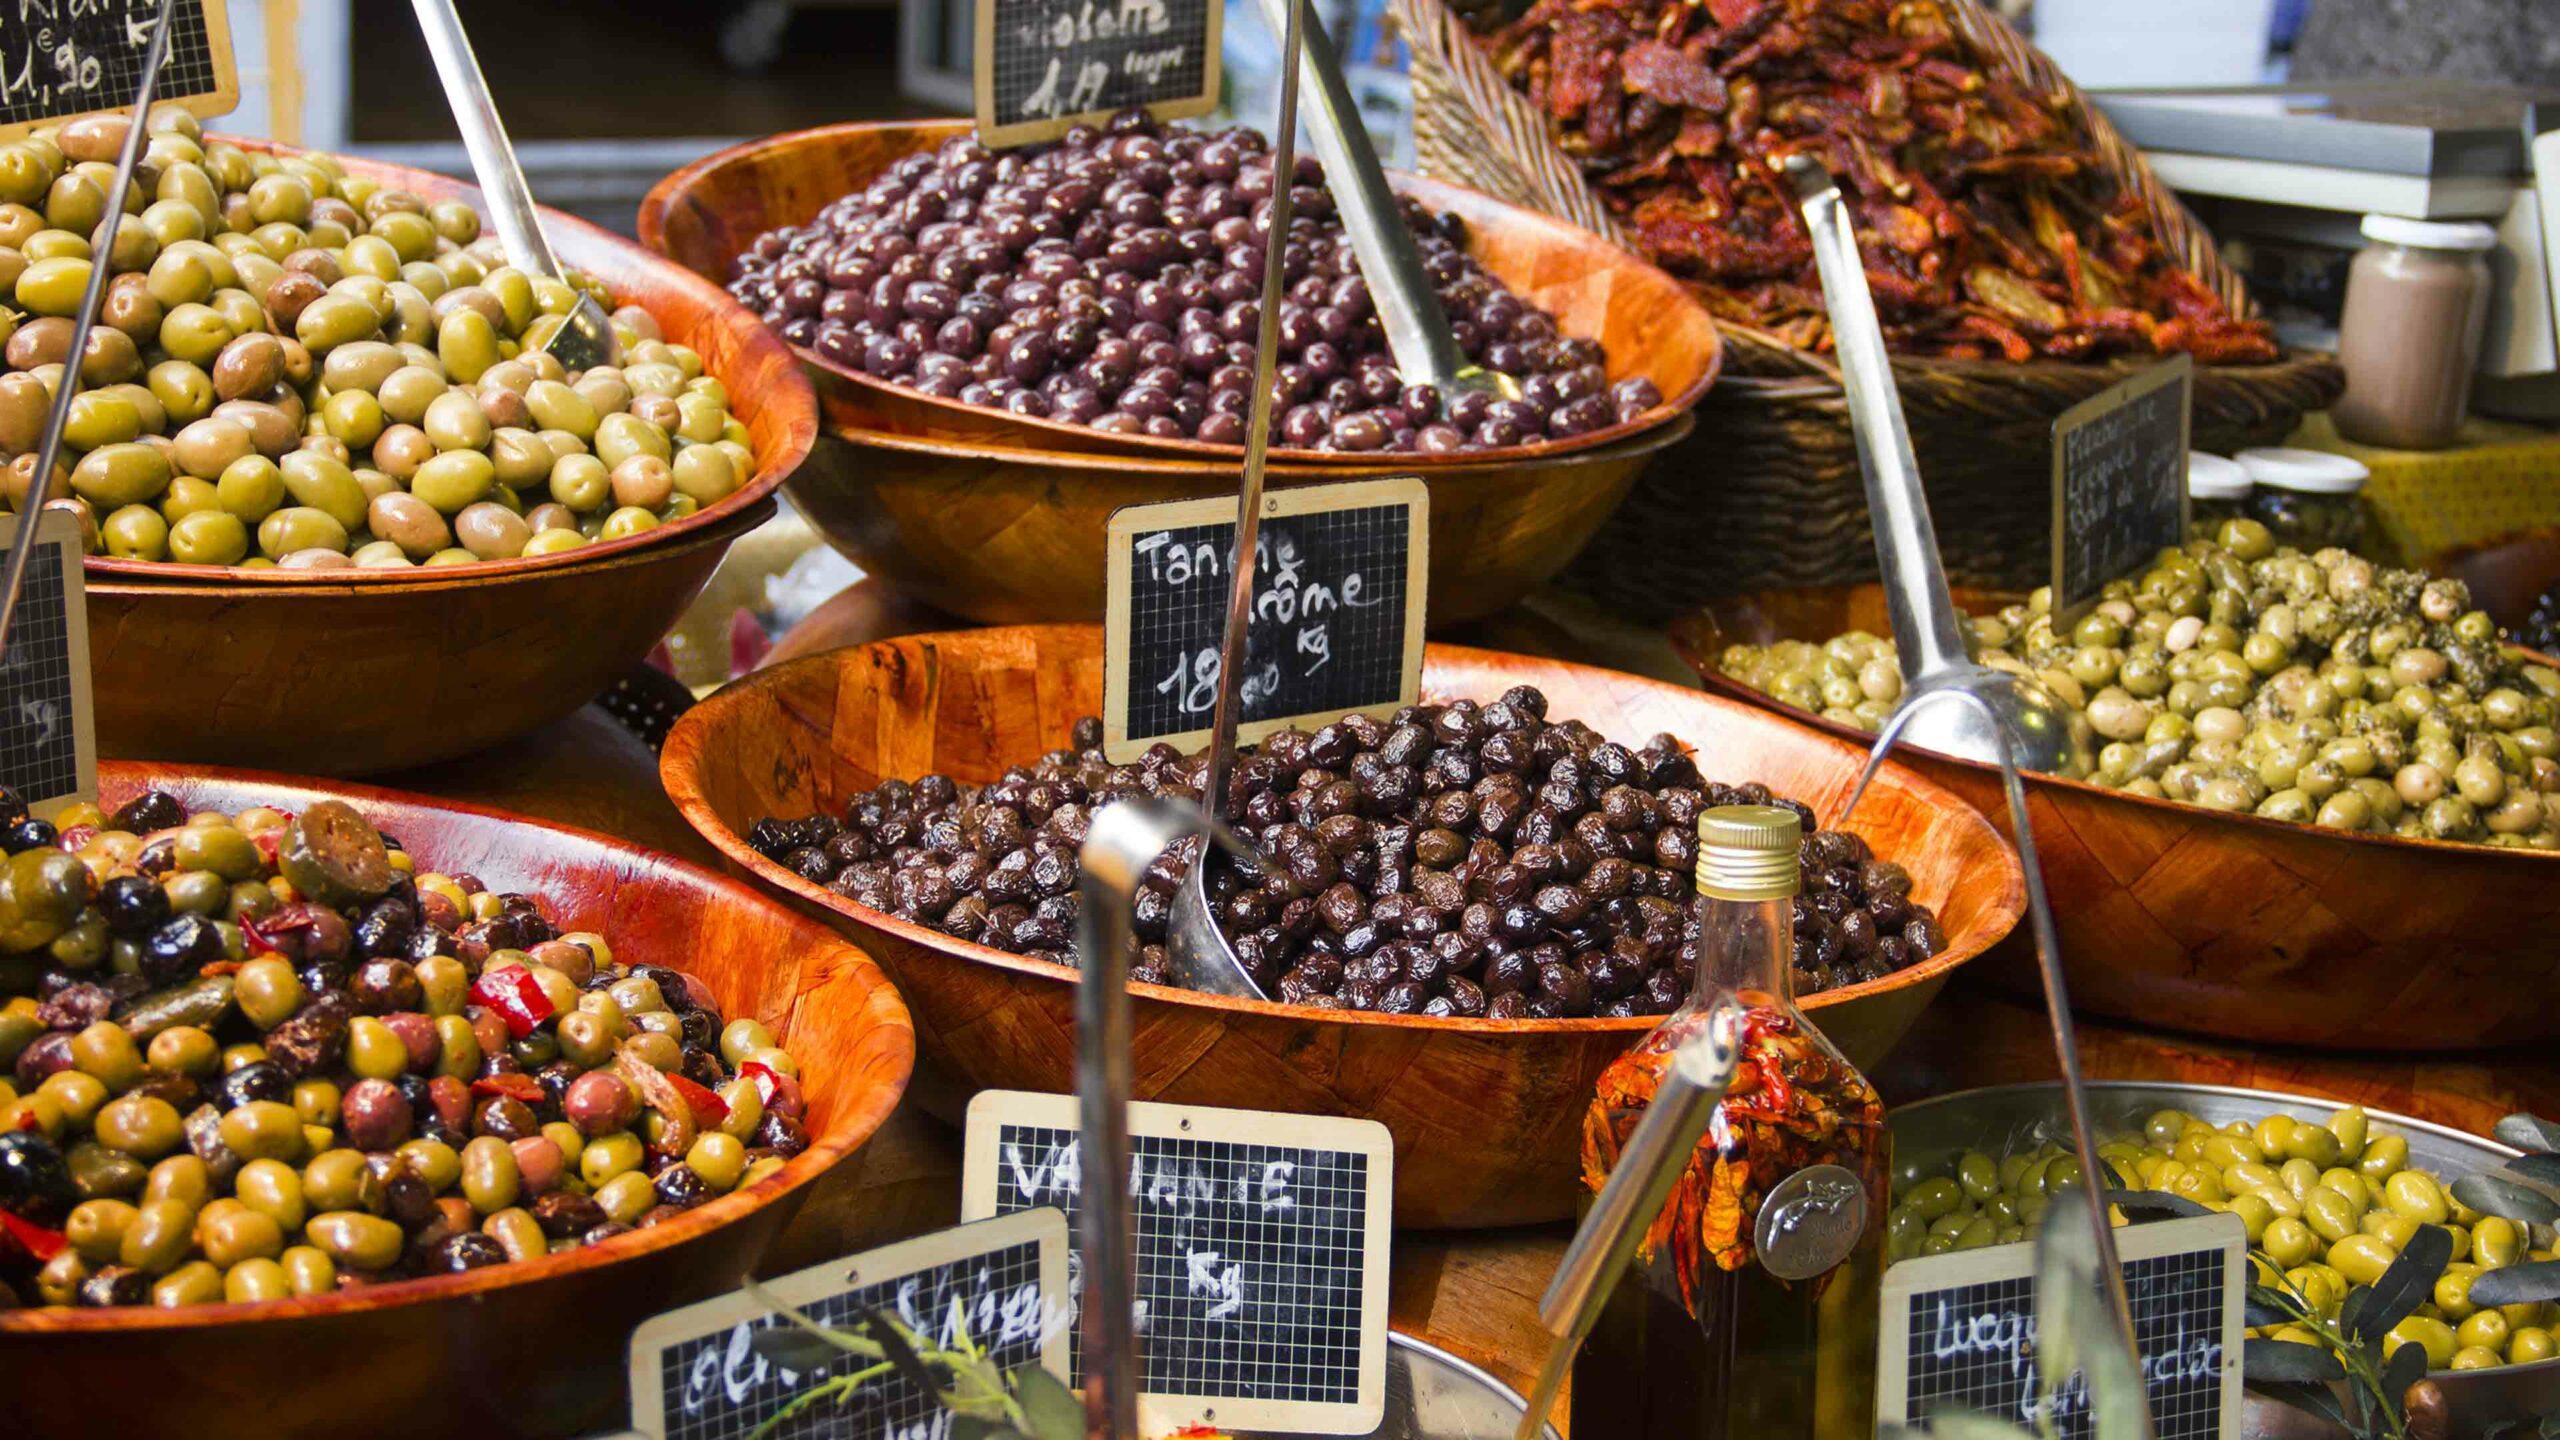 Italie markt